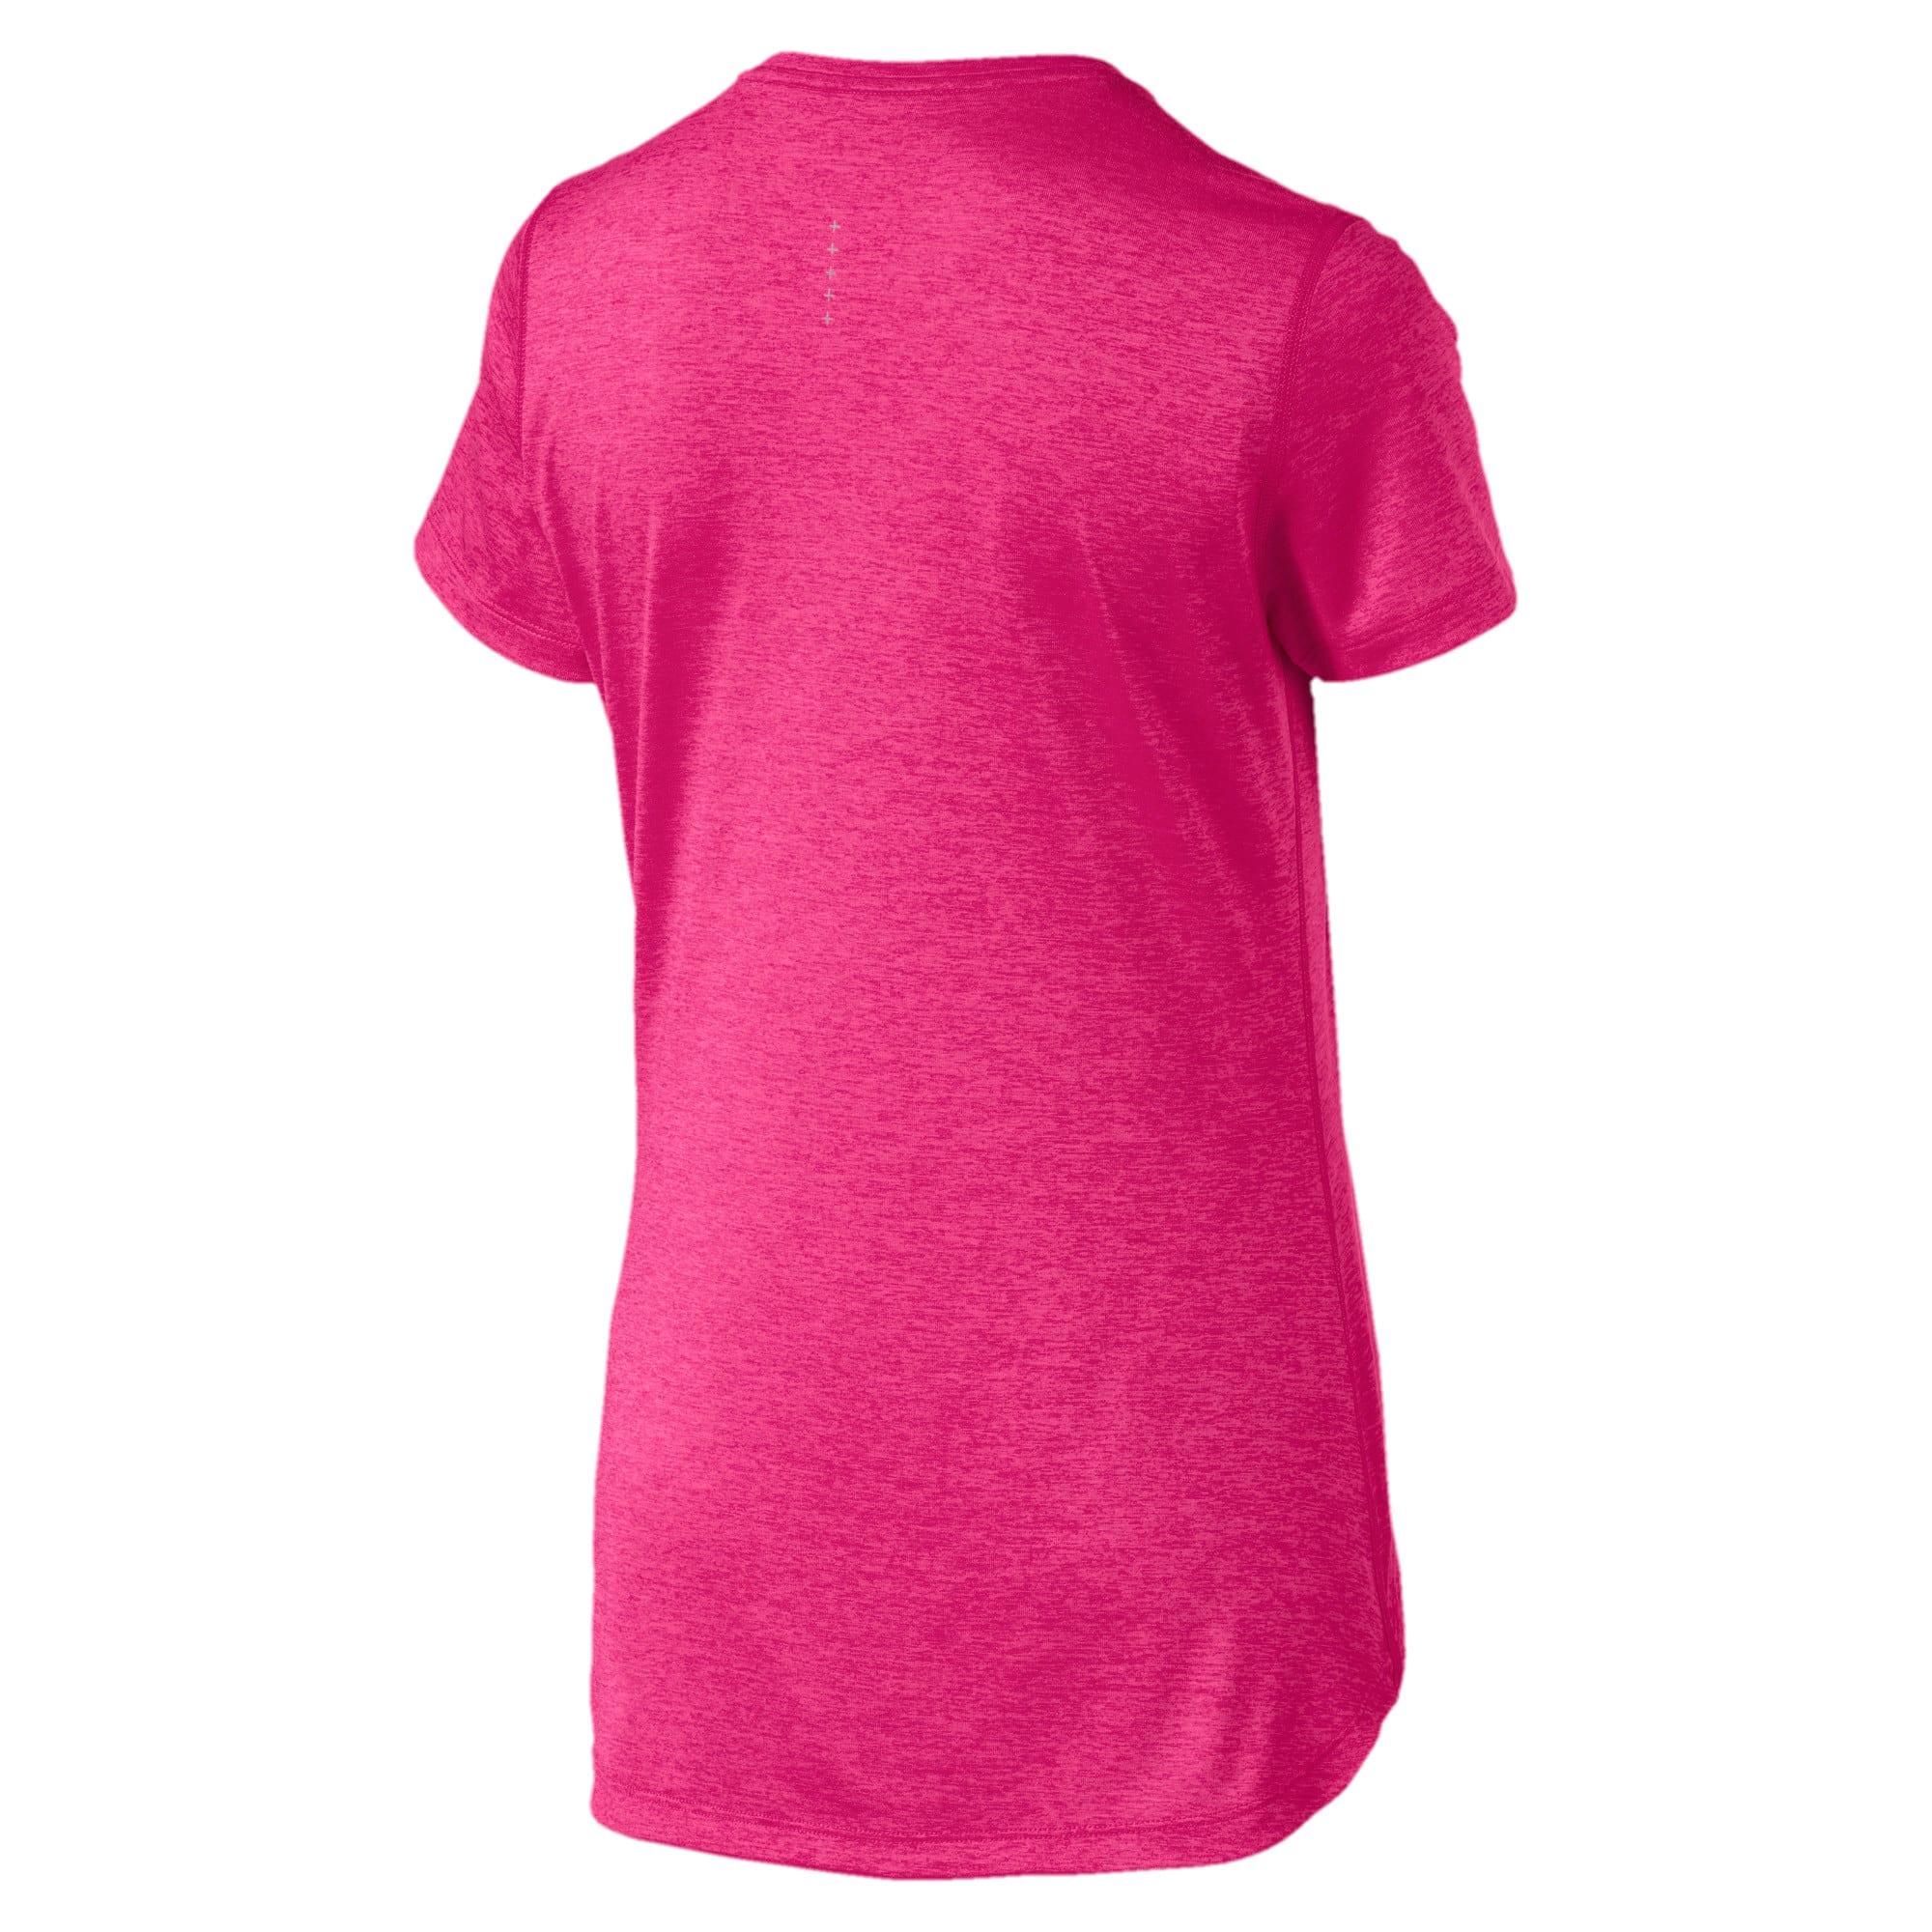 Thumbnail 5 of T-Shirt Epic Heather Running pour femme, Fuchsia Purple Heather, medium